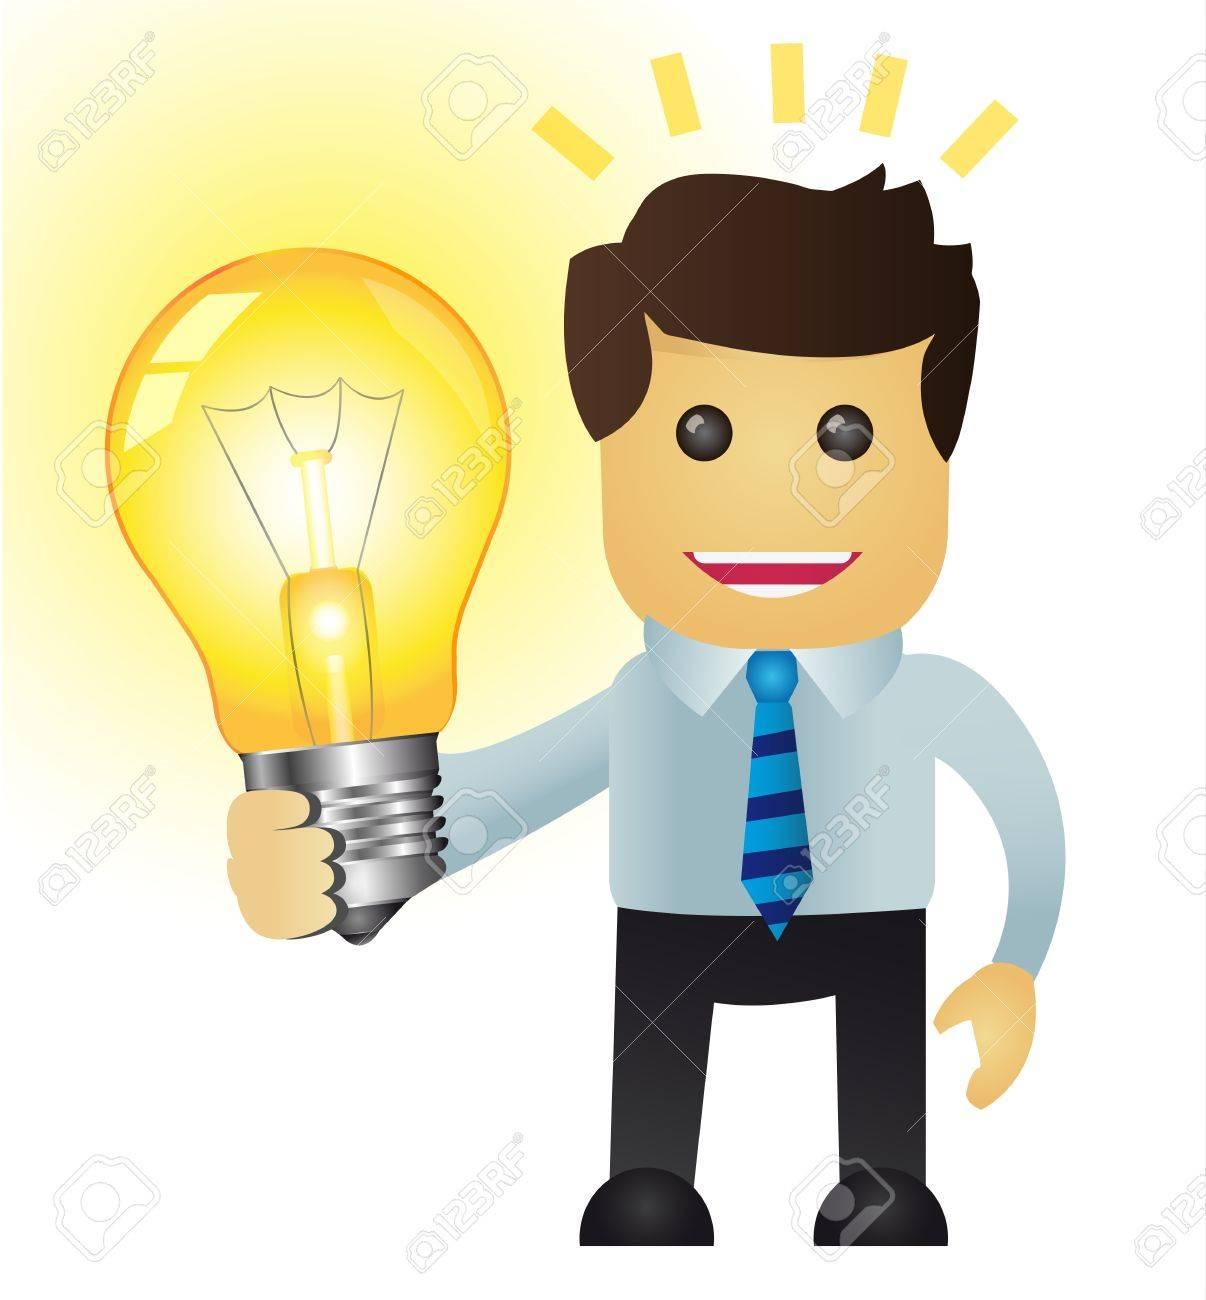 Business man with an Idea - 19020962